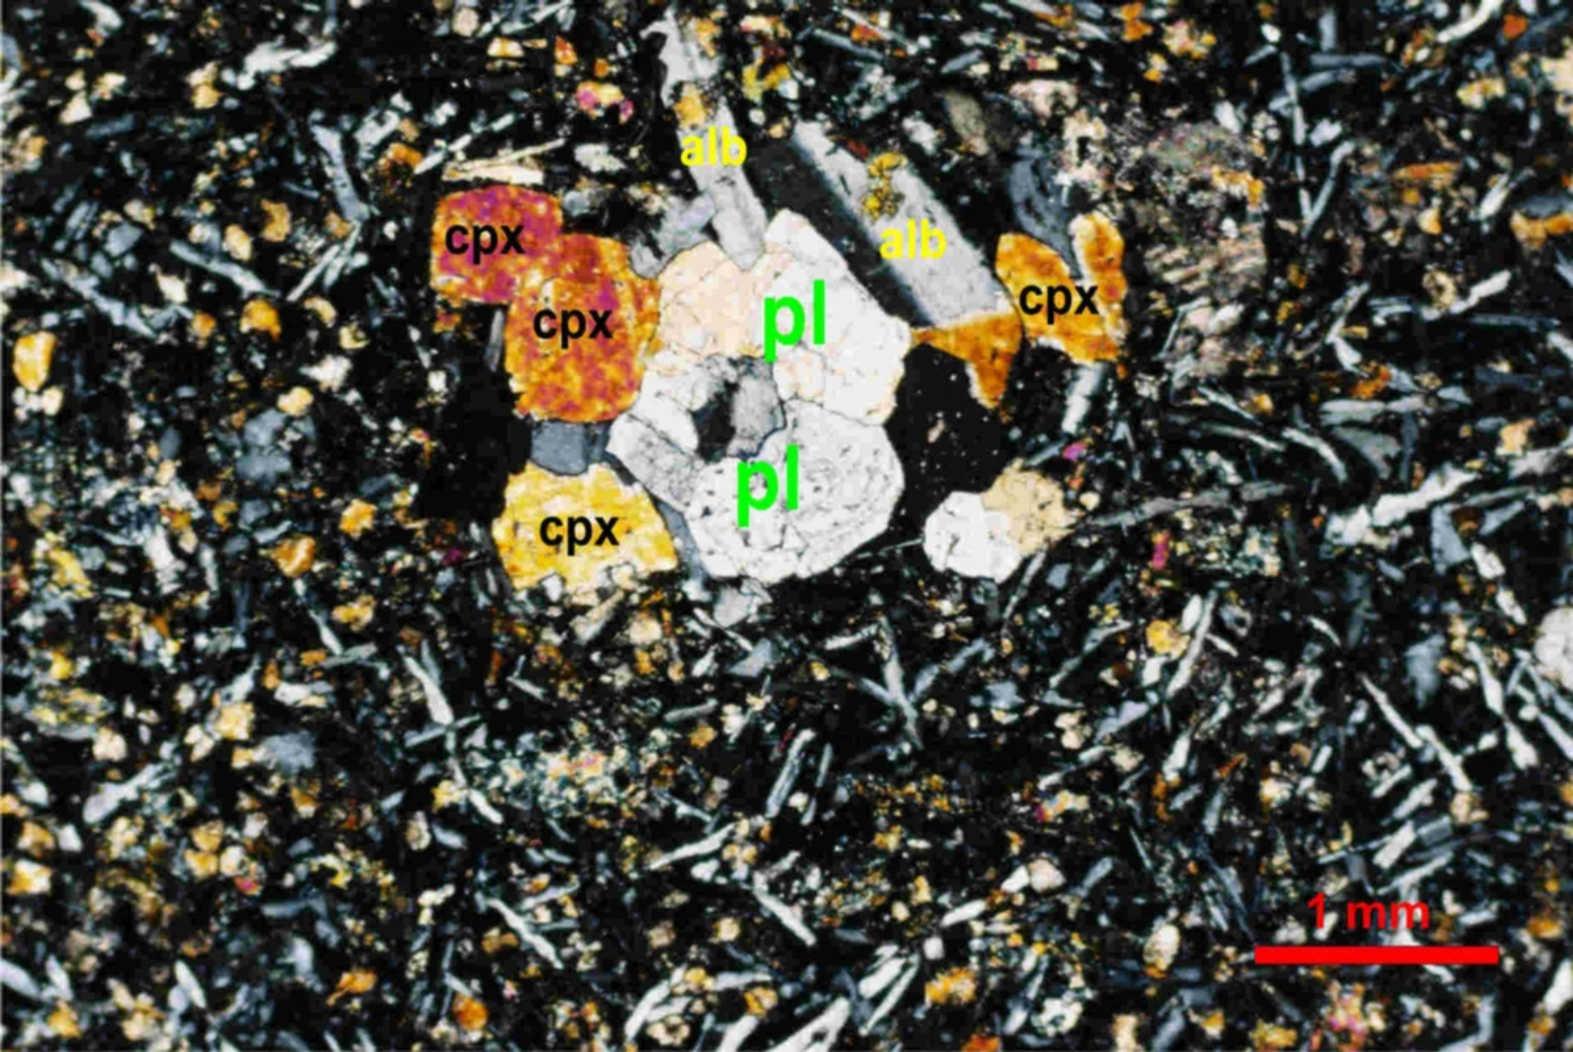 glomeroporfirni bazalt Medvednica